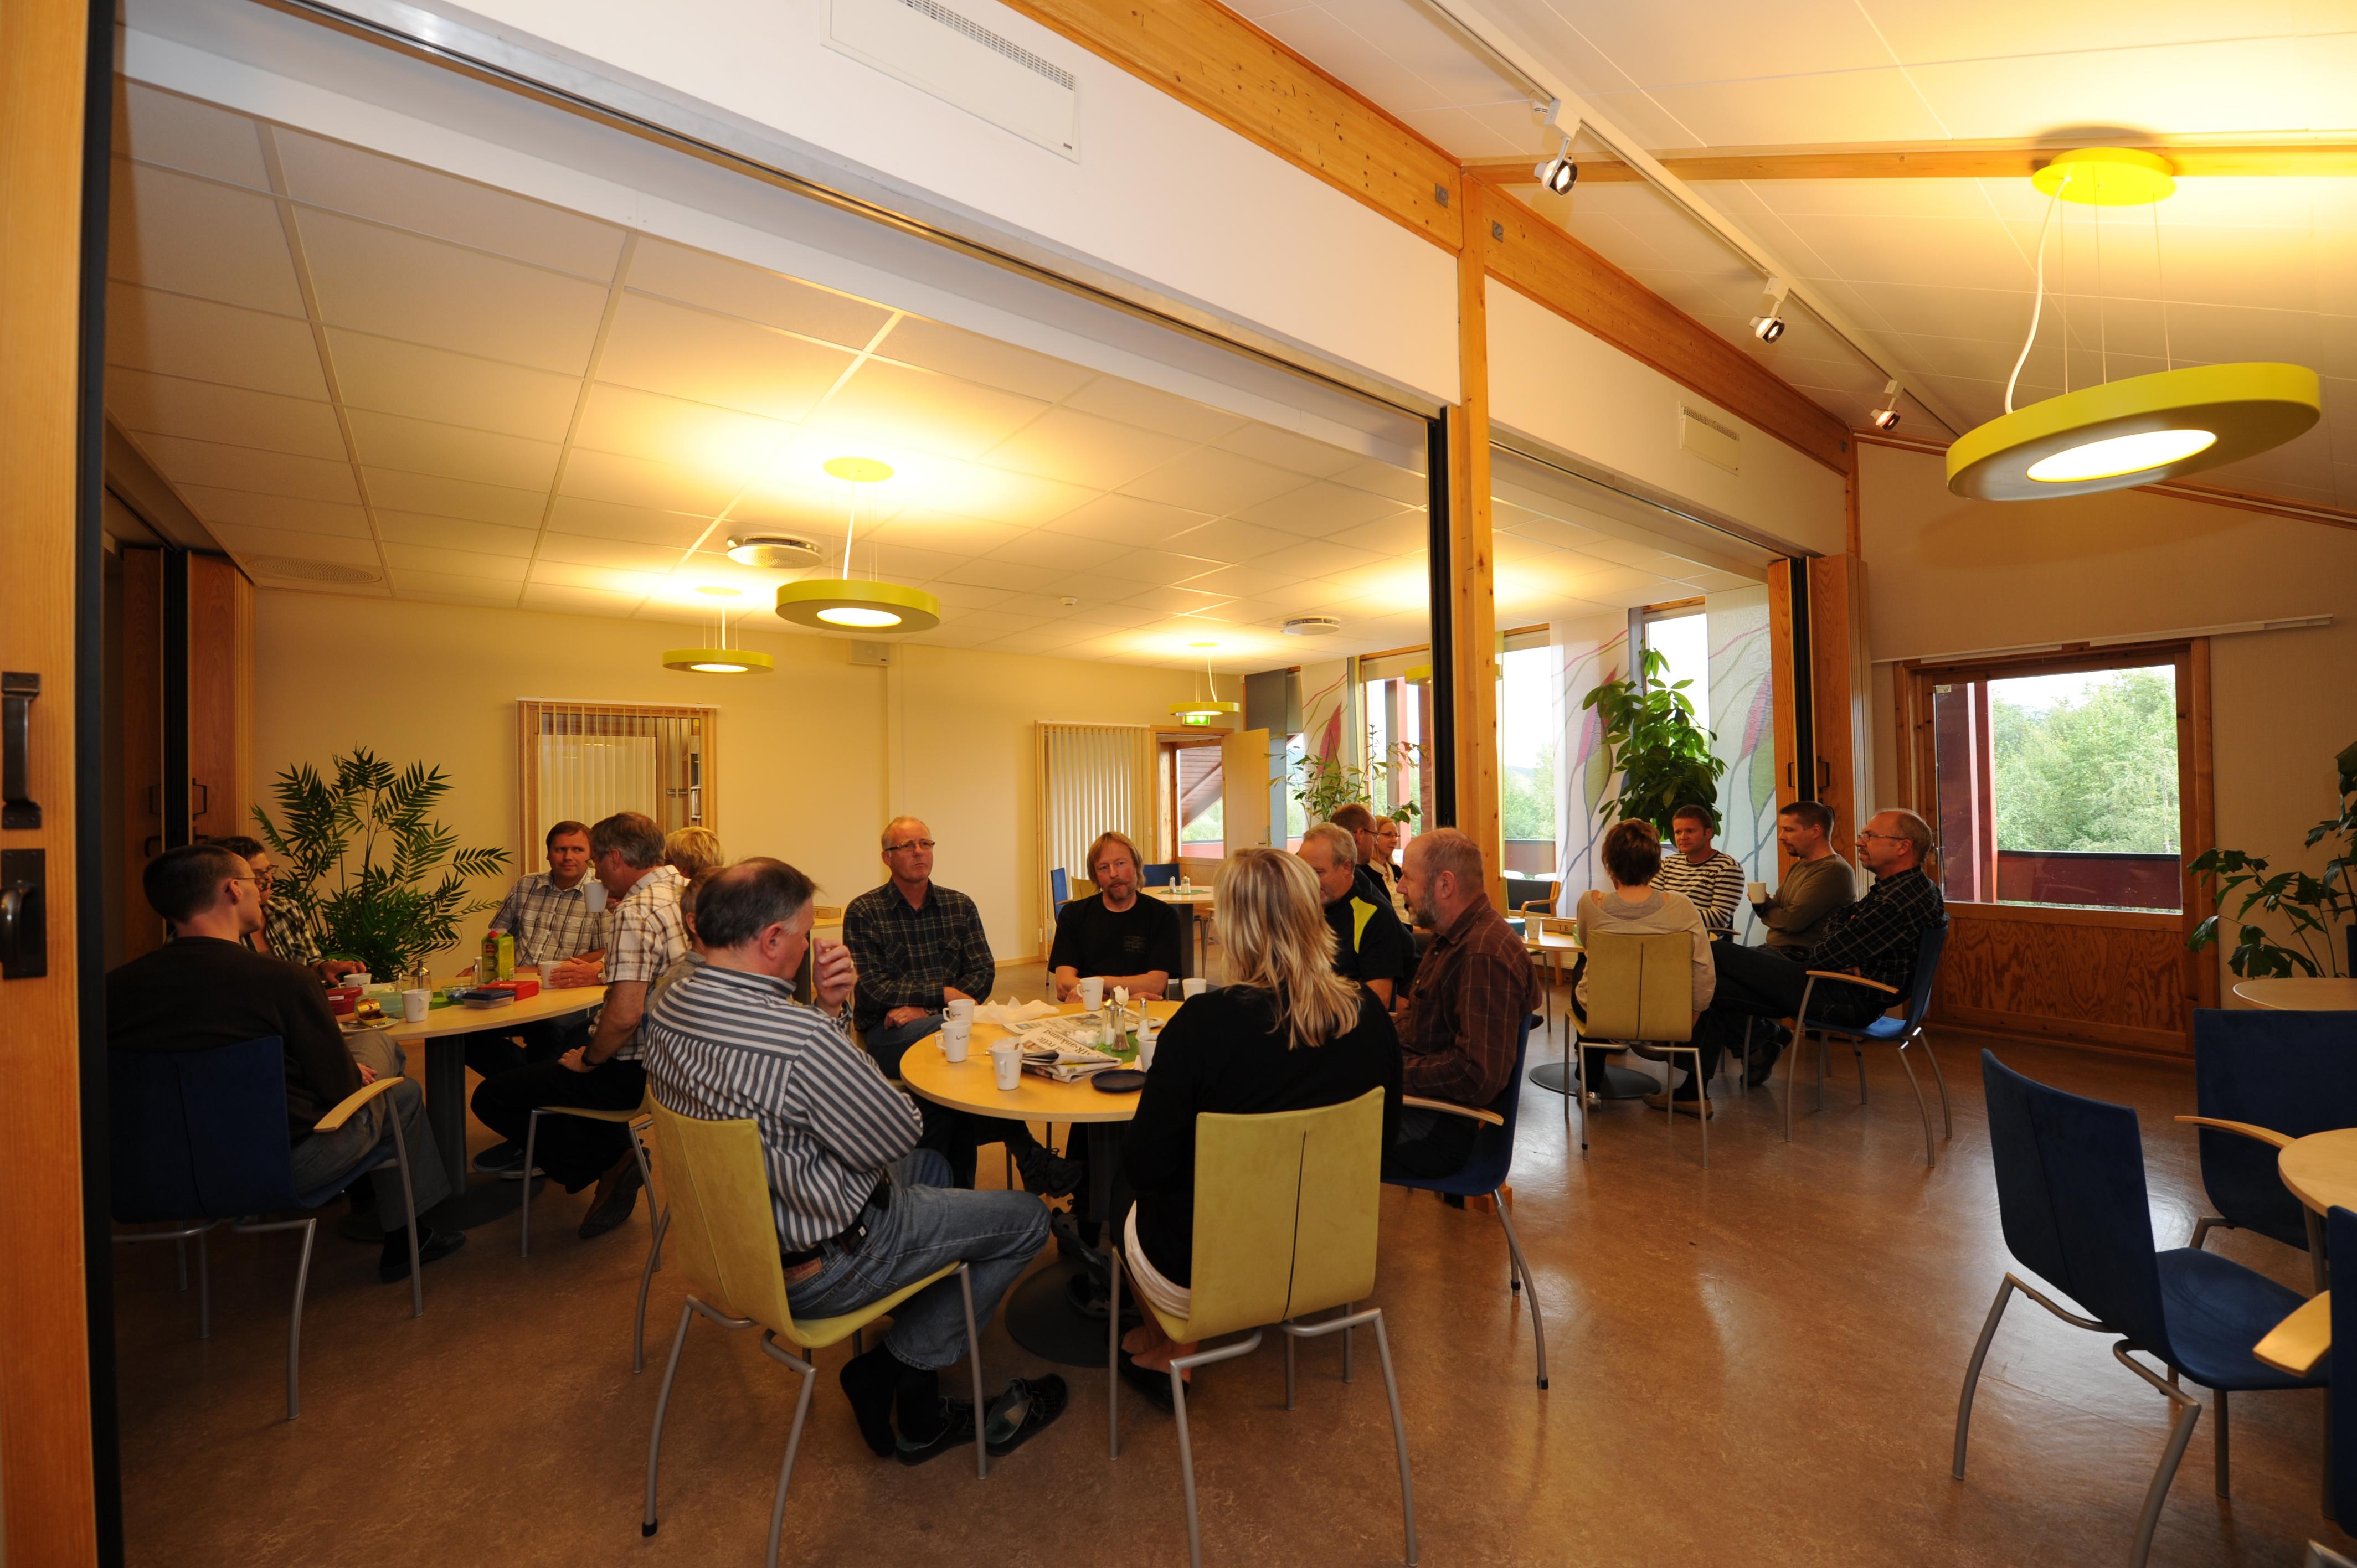 Bilde fra lunsjen i kantina i Tomtegata 8